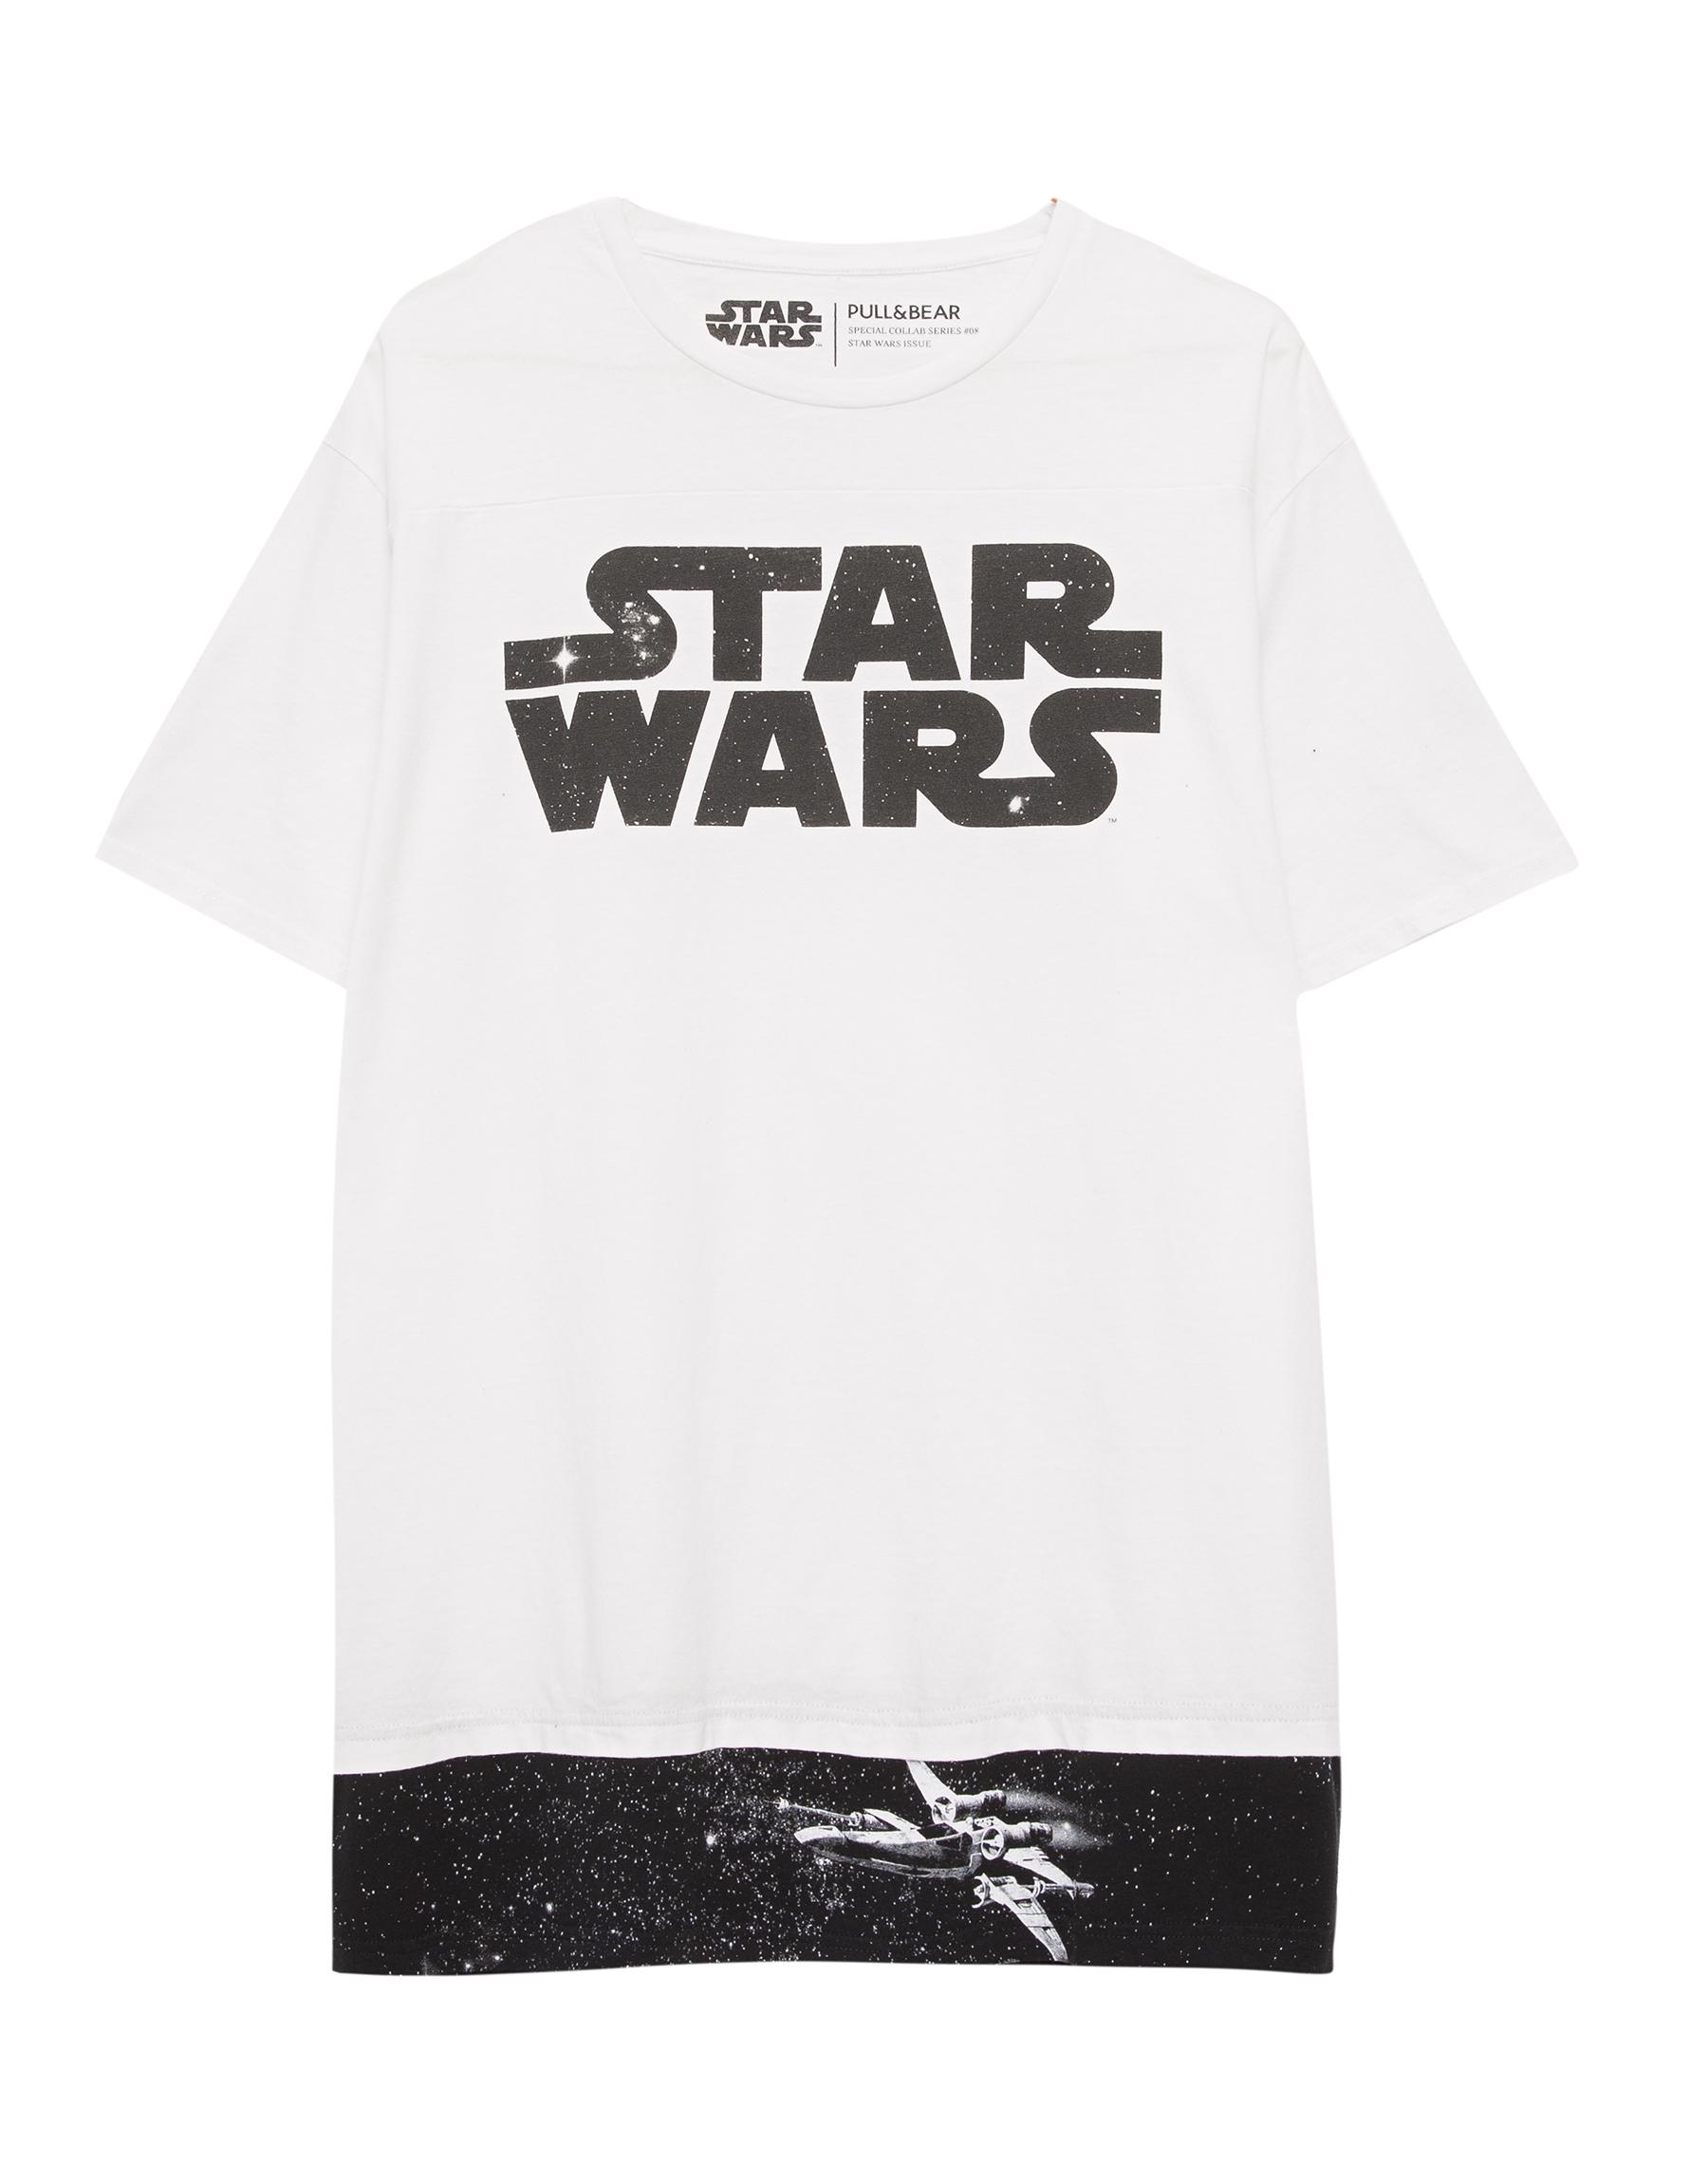 Le capsule collection di Star Wars